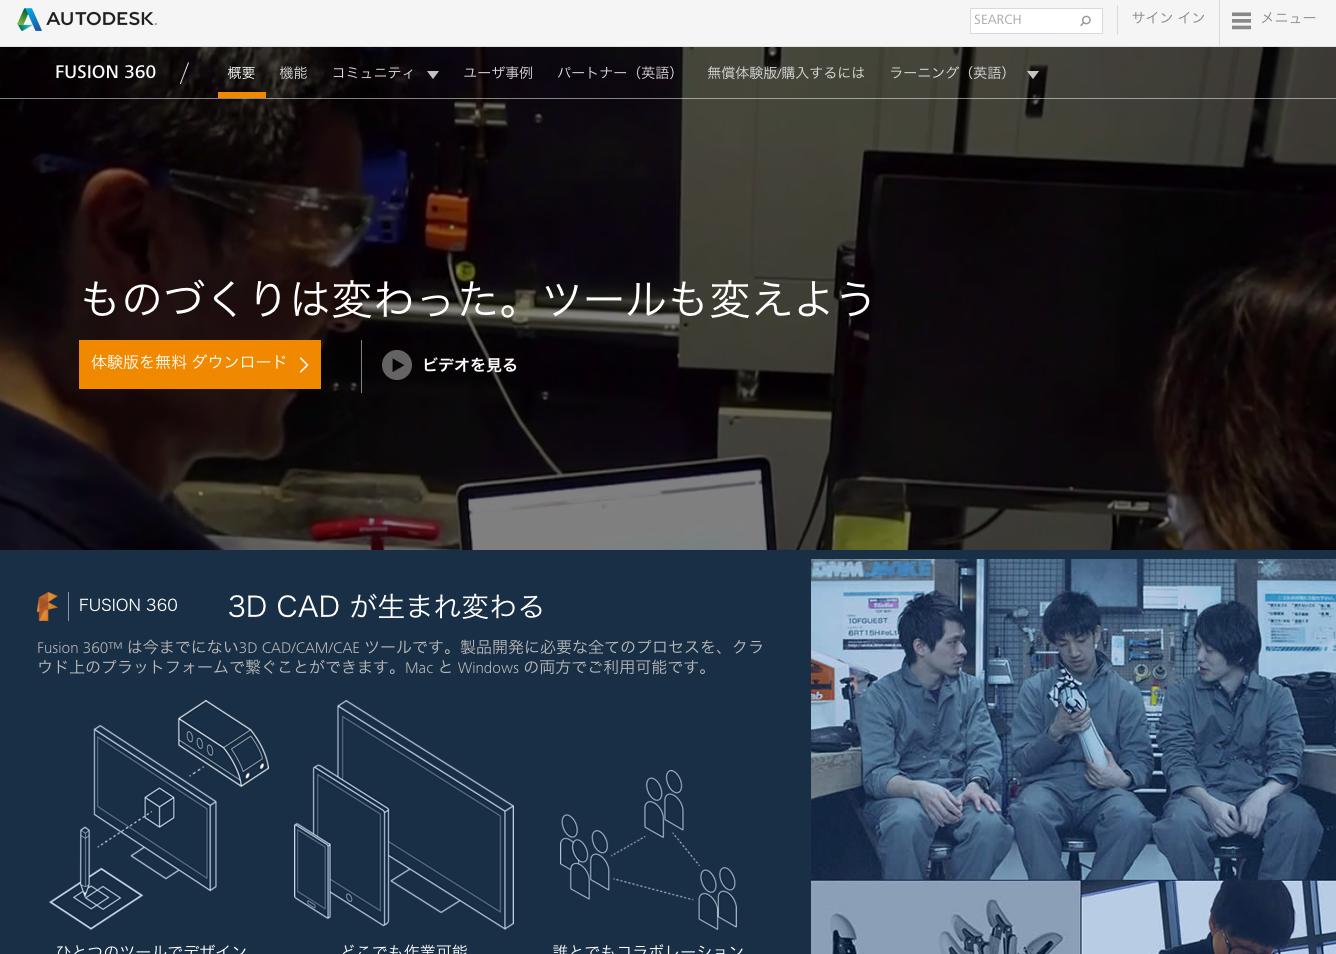 Fusion360の日本語公式ページ